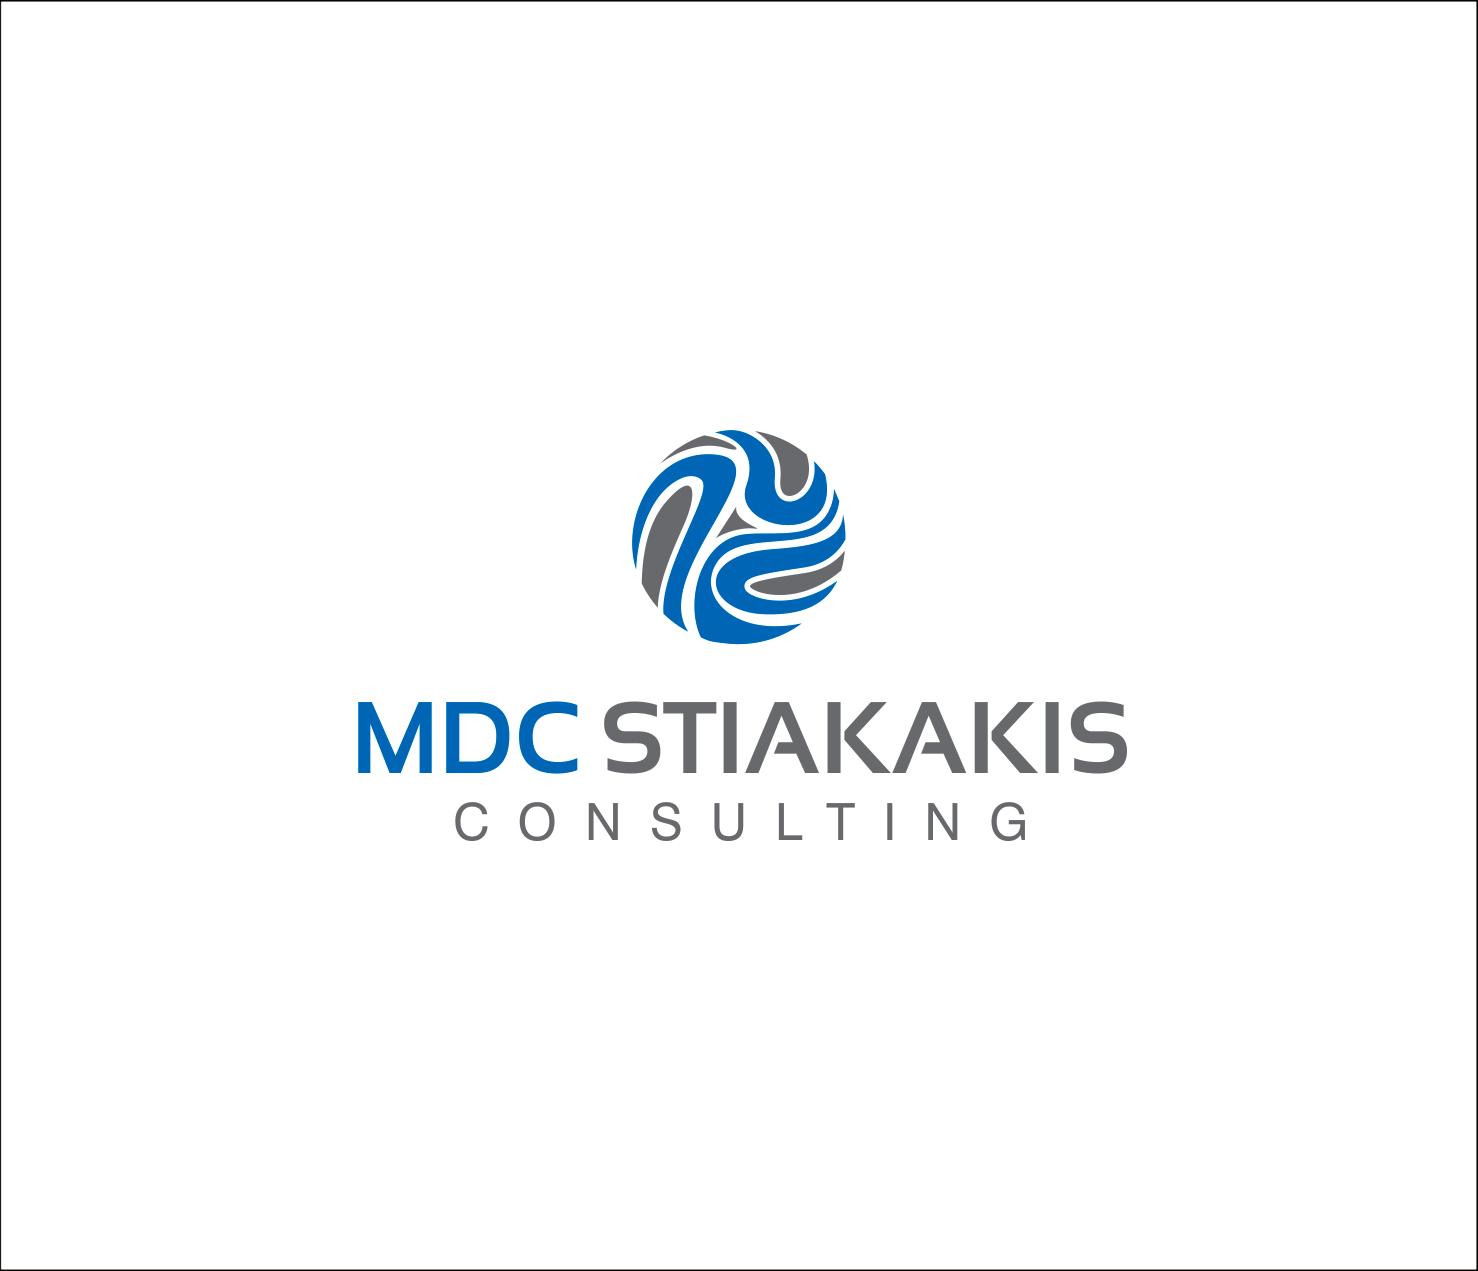 Logo Design by Armada Jamaluddin - Entry No. 65 in the Logo Design Contest Unique Logo Design Wanted for MDC STIAKAKIS.